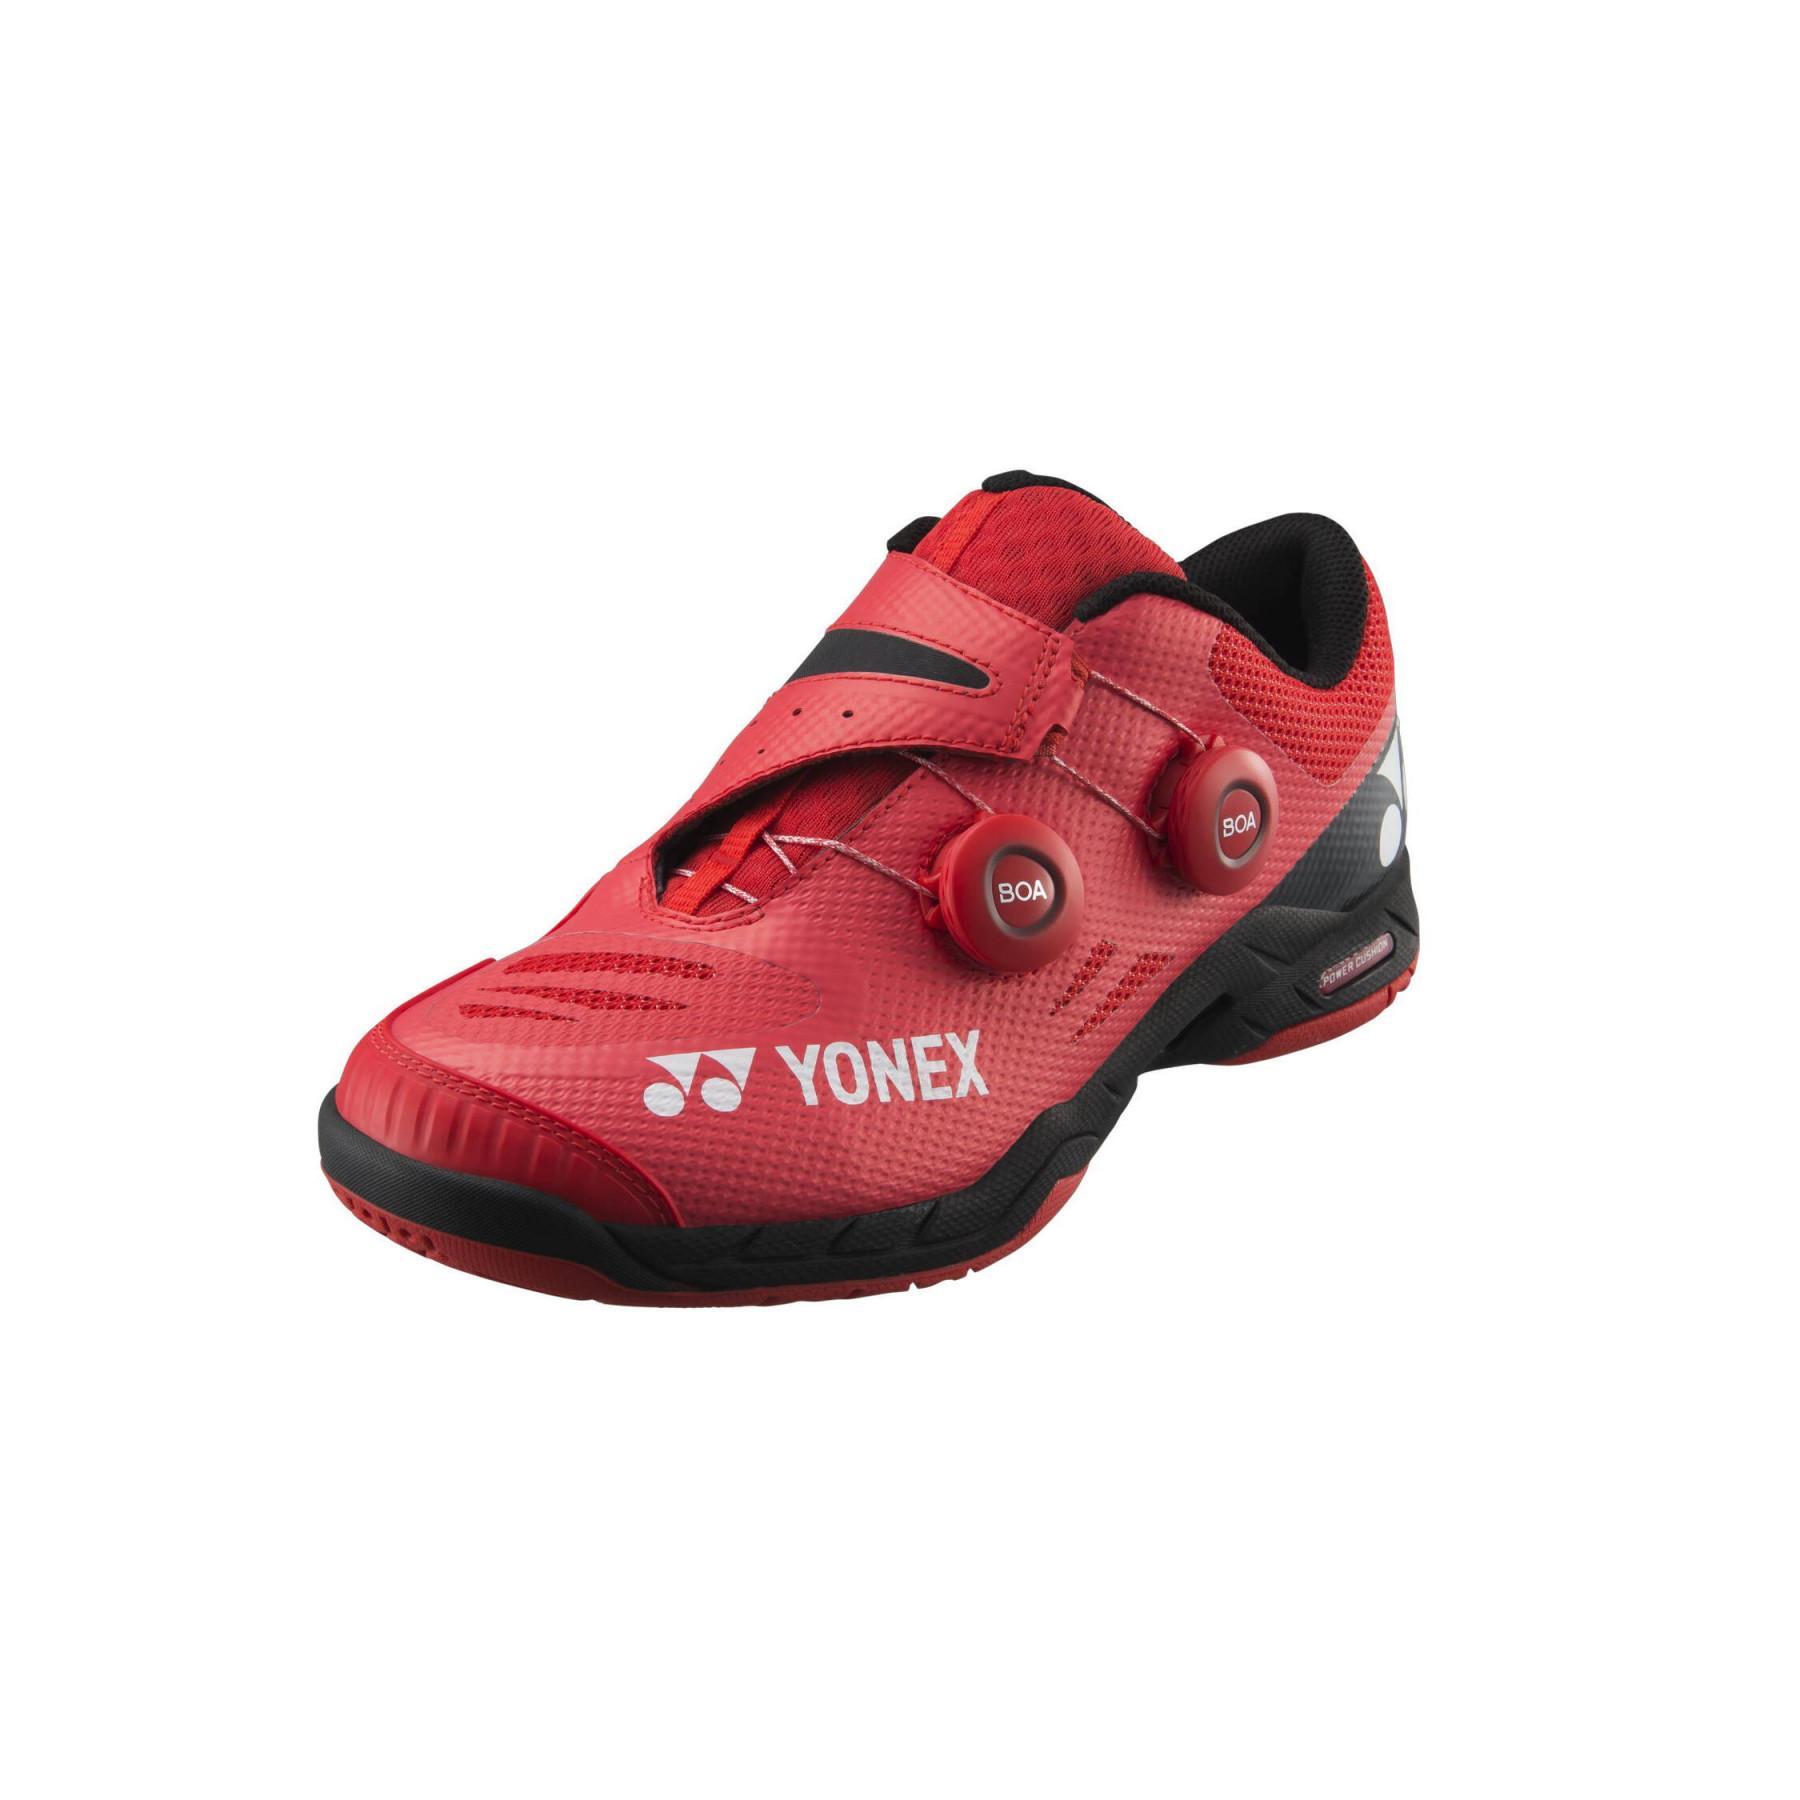 Shoes Yonex power cushion infinity